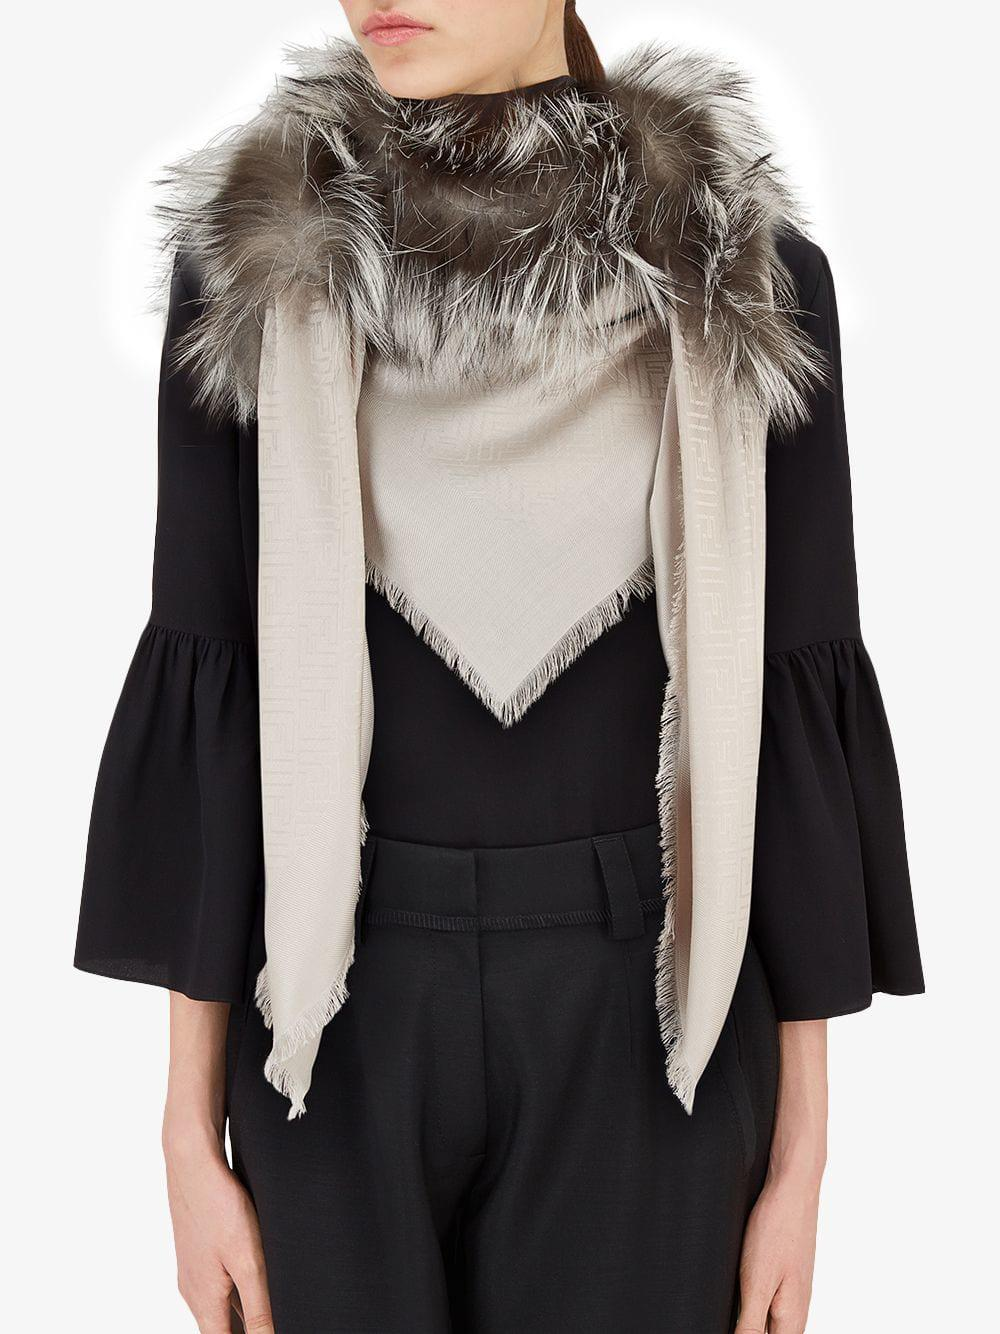 Fendi - Multicolor Chal Touch of Fur - Lyst. Ver en pantalla completa b50d8872edd